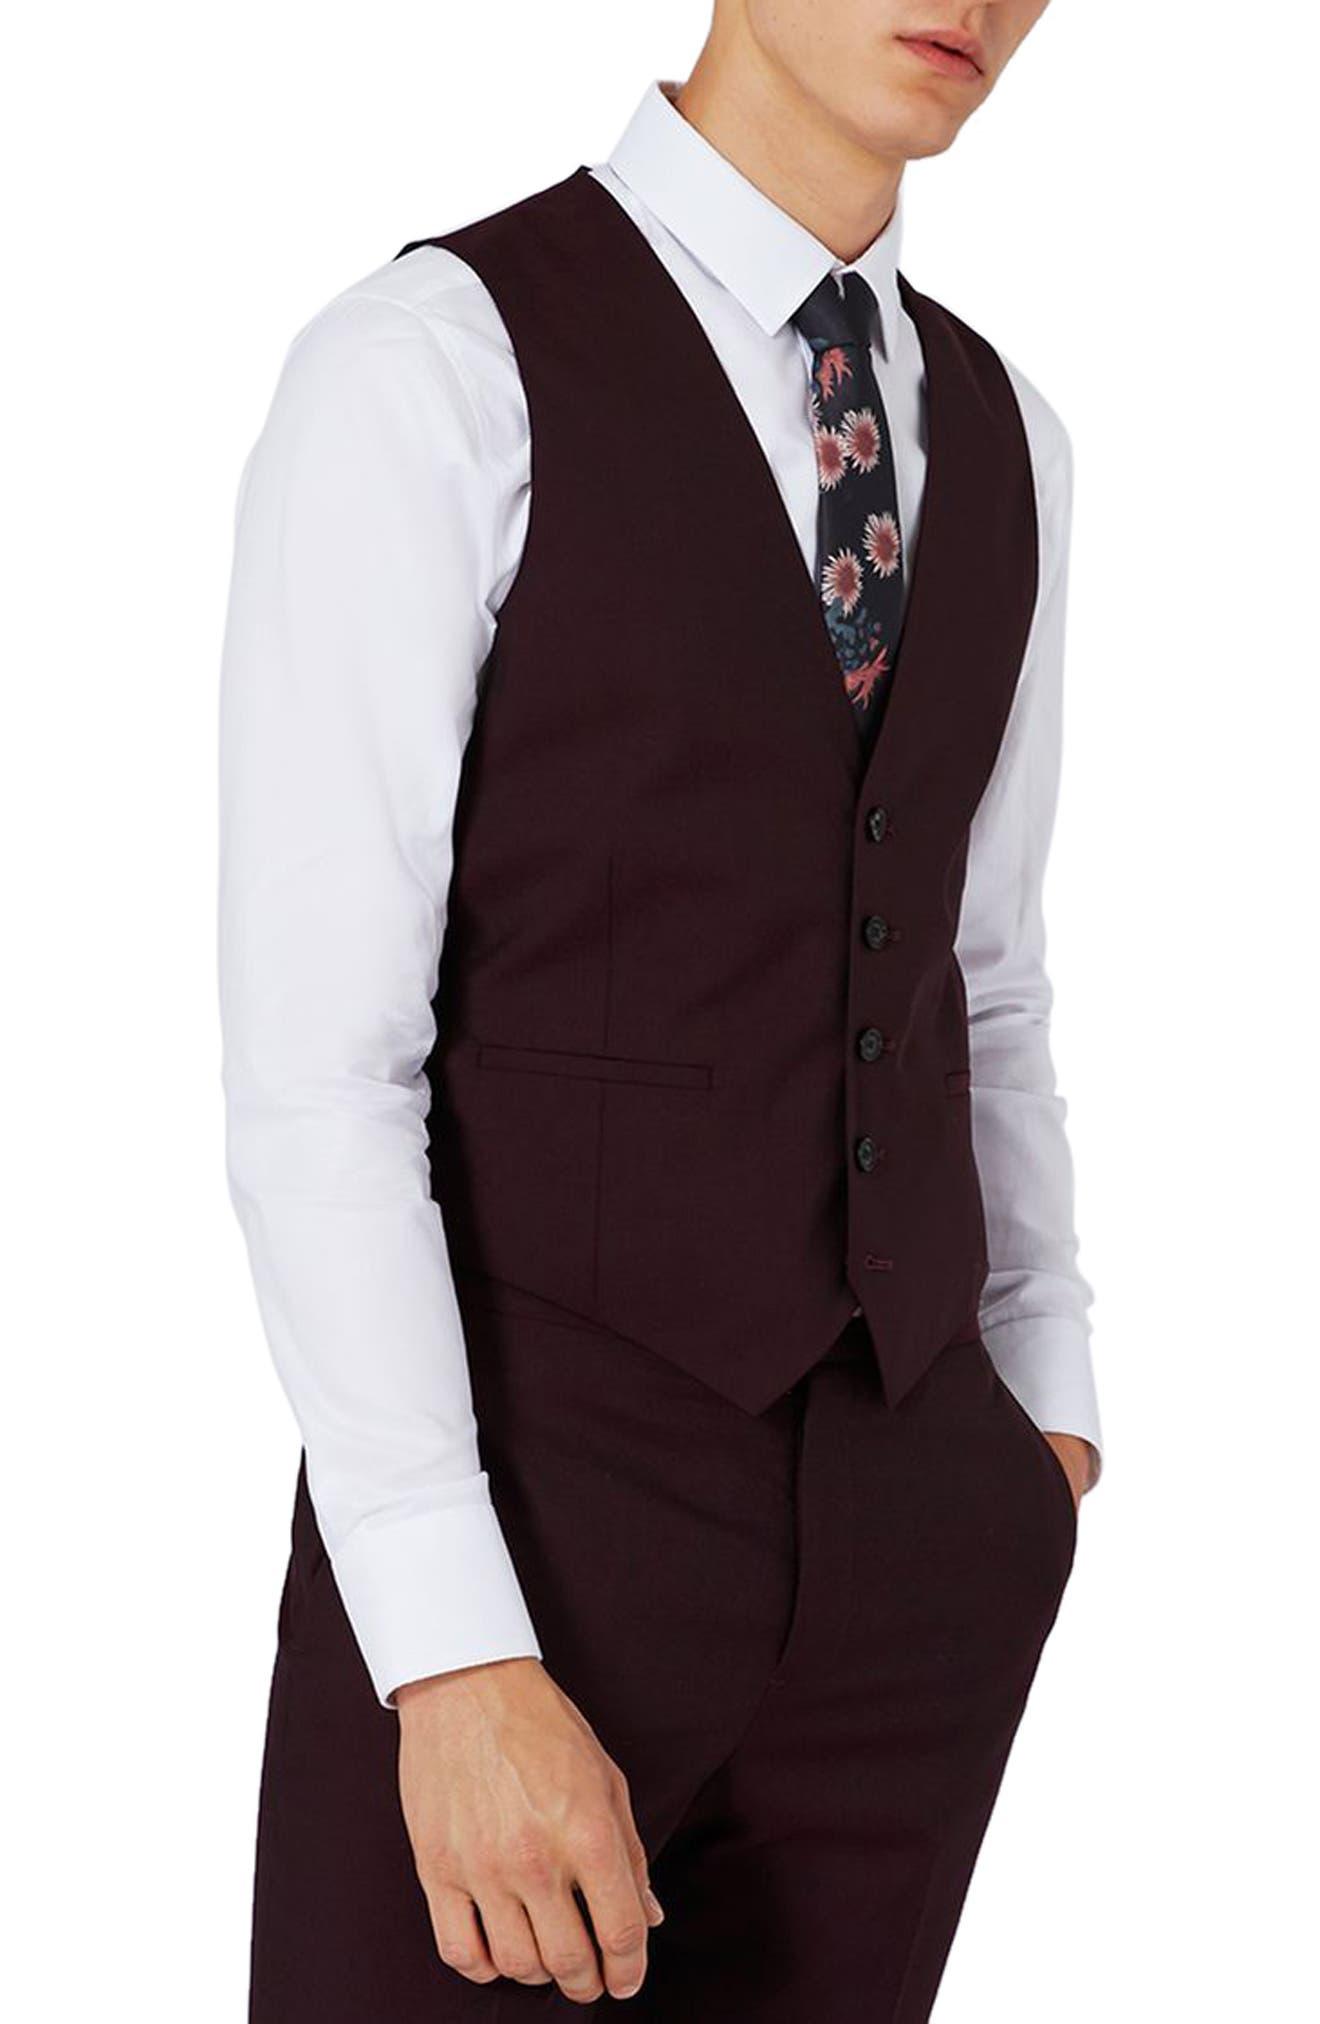 TOPMAN Charlie Casely-Hayford x Topman Skinny Fit Vest